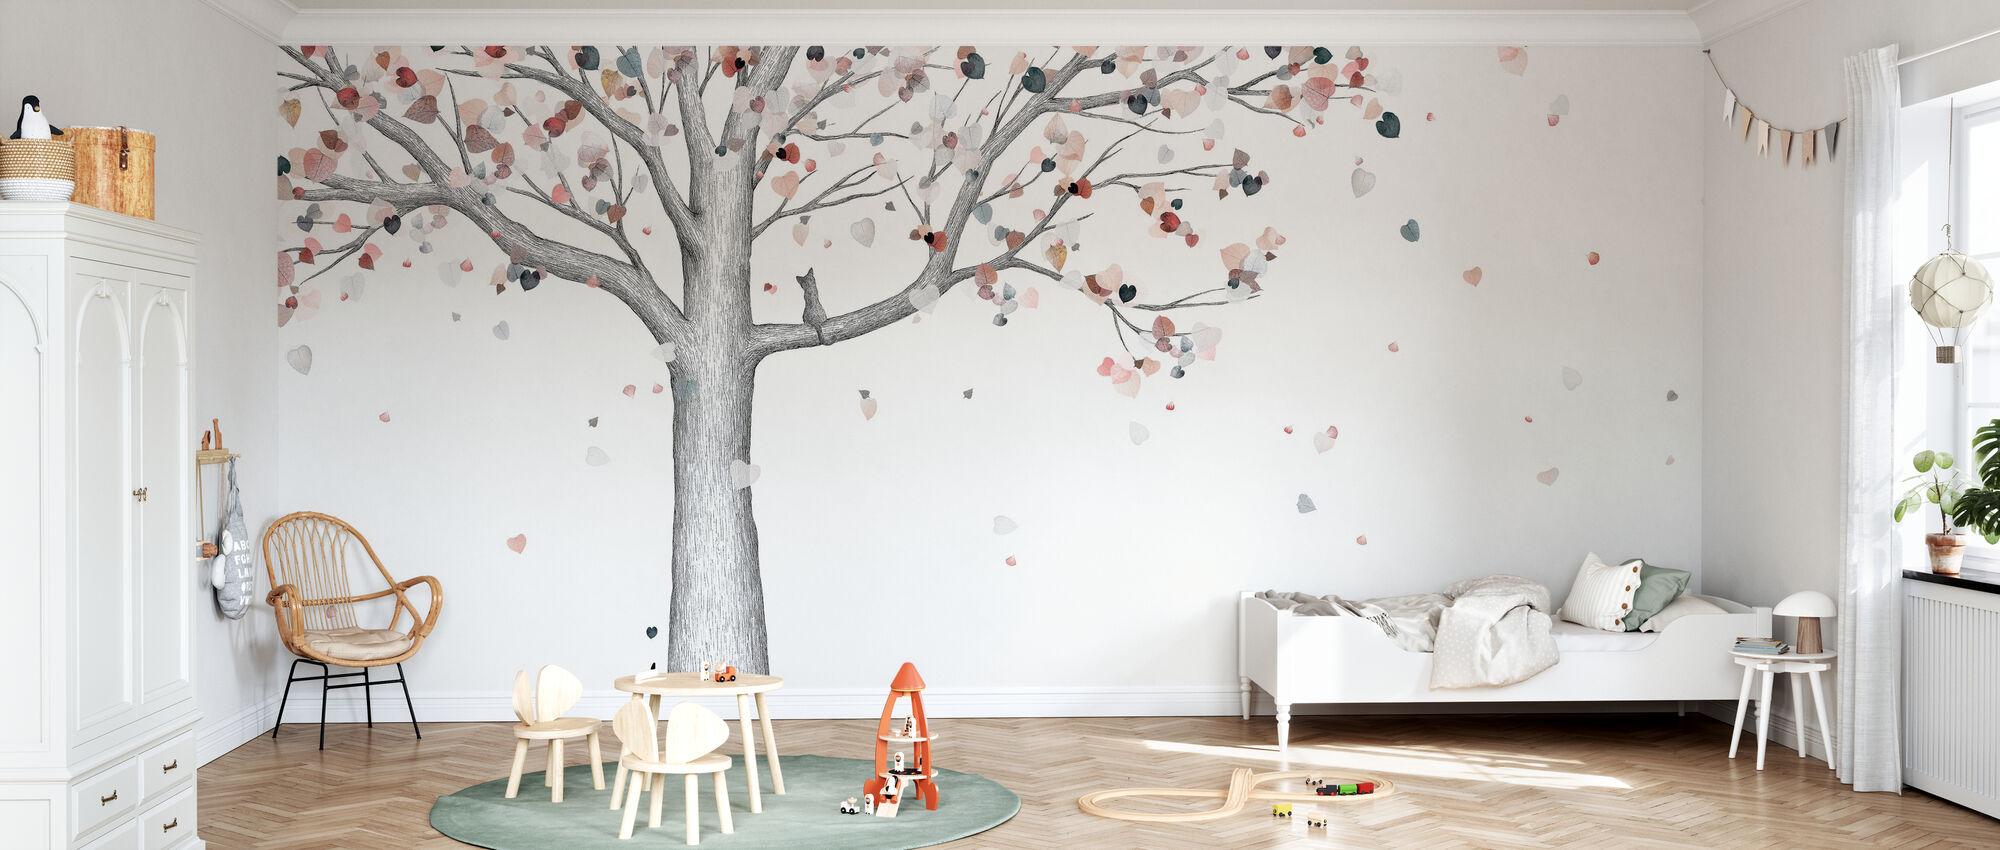 Herbst - Cat - Tapete - Kinderzimmer